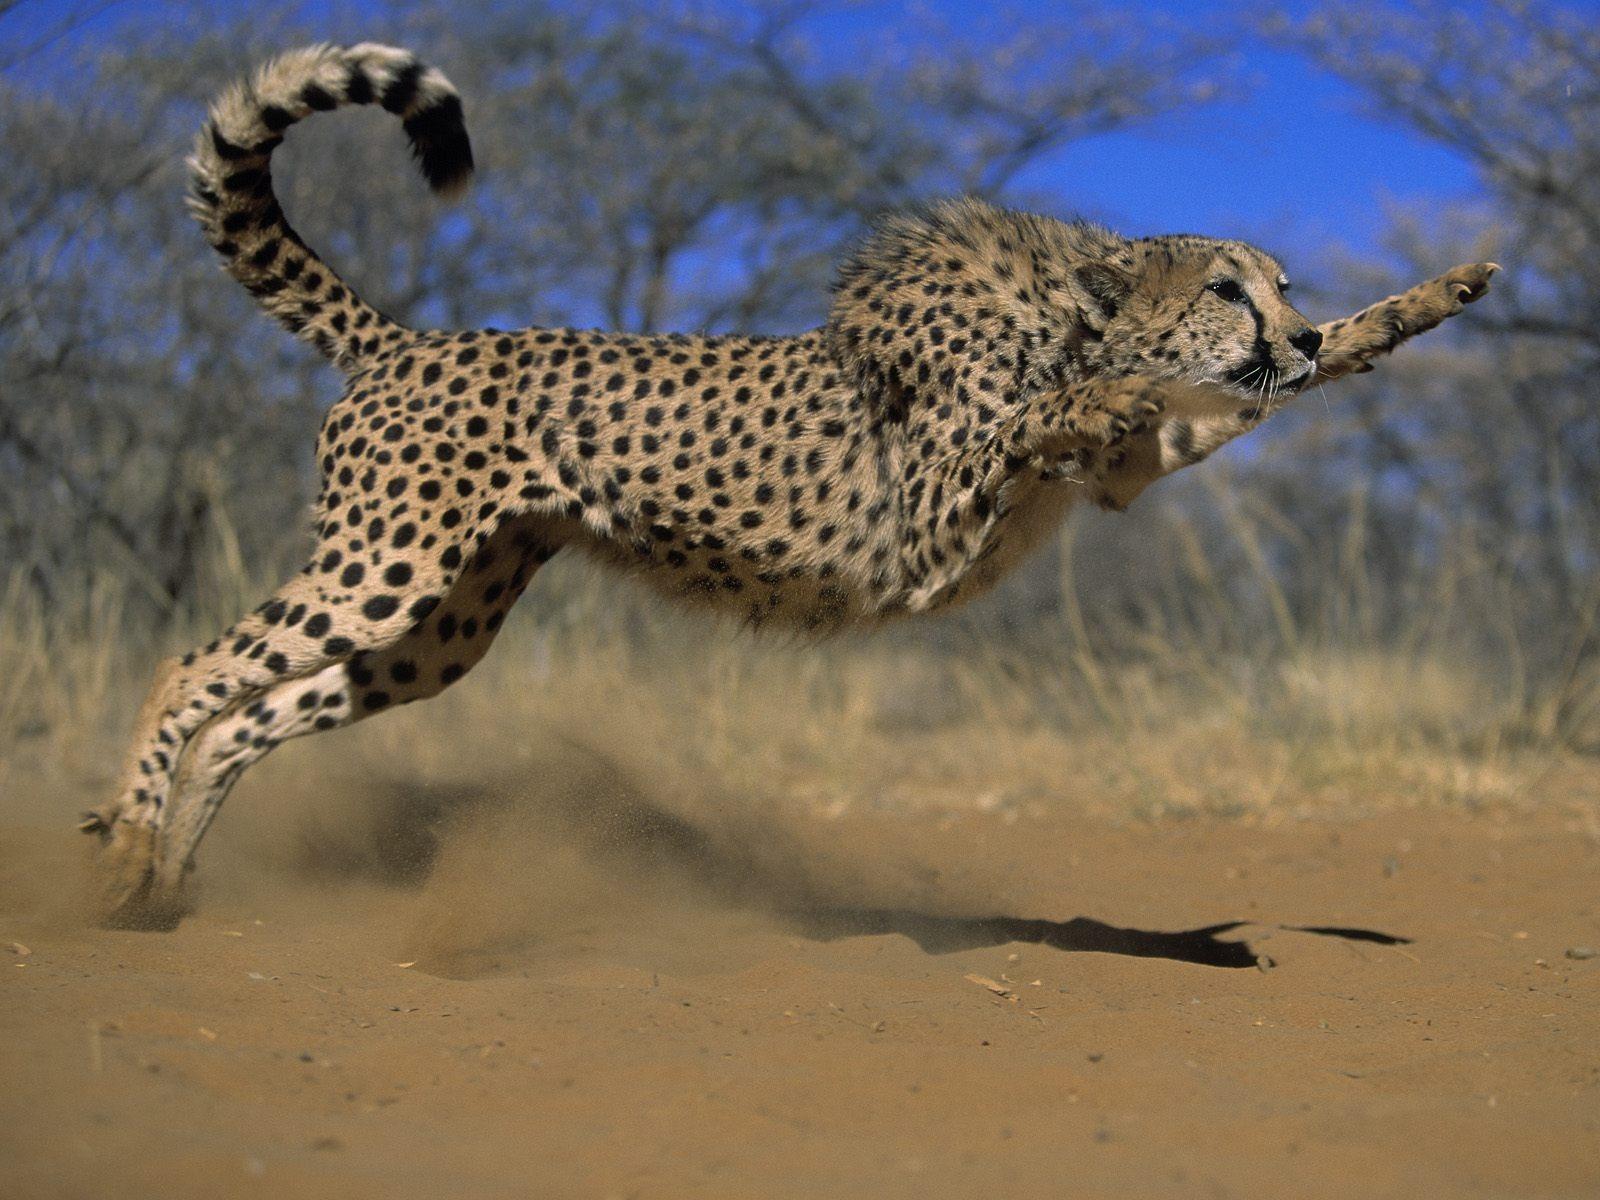 http://2.bp.blogspot.com/-ObT5VRKyMKg/T6k-WroO2yI/AAAAAAAAeBU/rojt7mvTolM/s1600/Cheetah-jump-hd-wallpaper.jpg